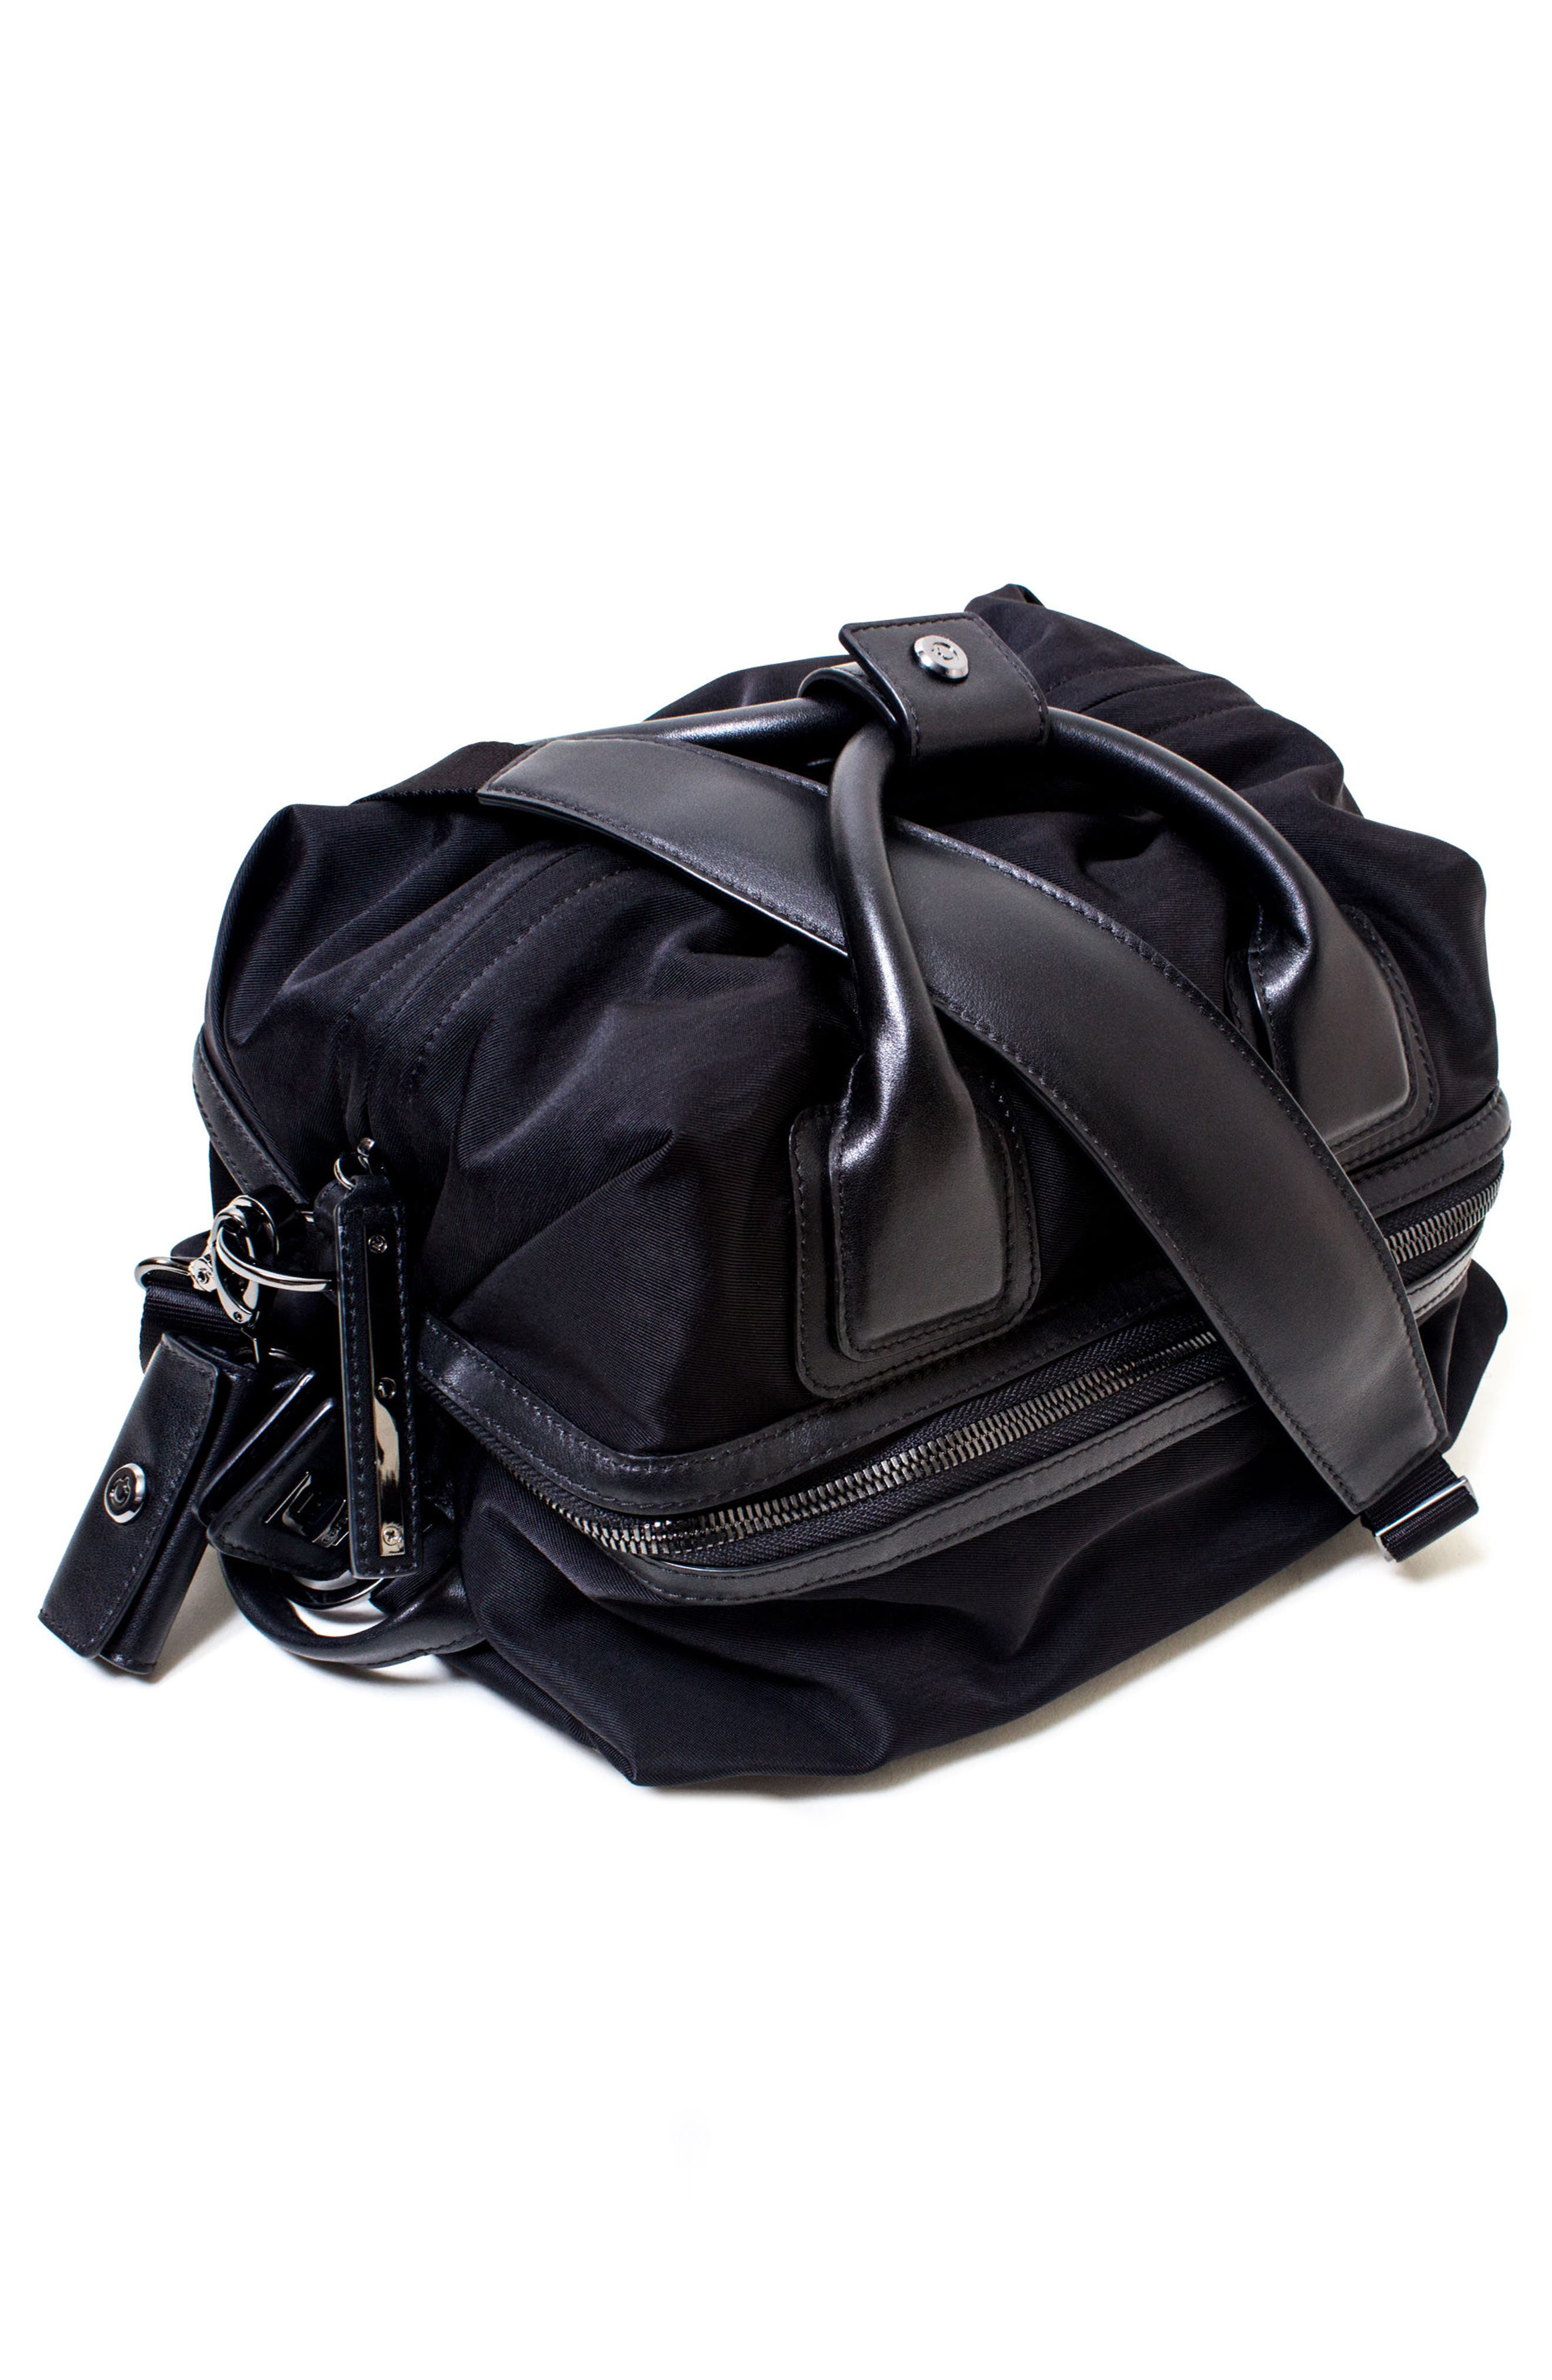 Studio Duffel Backpack,                             Alternate thumbnail 10, color,                             BLACK/ GOLD